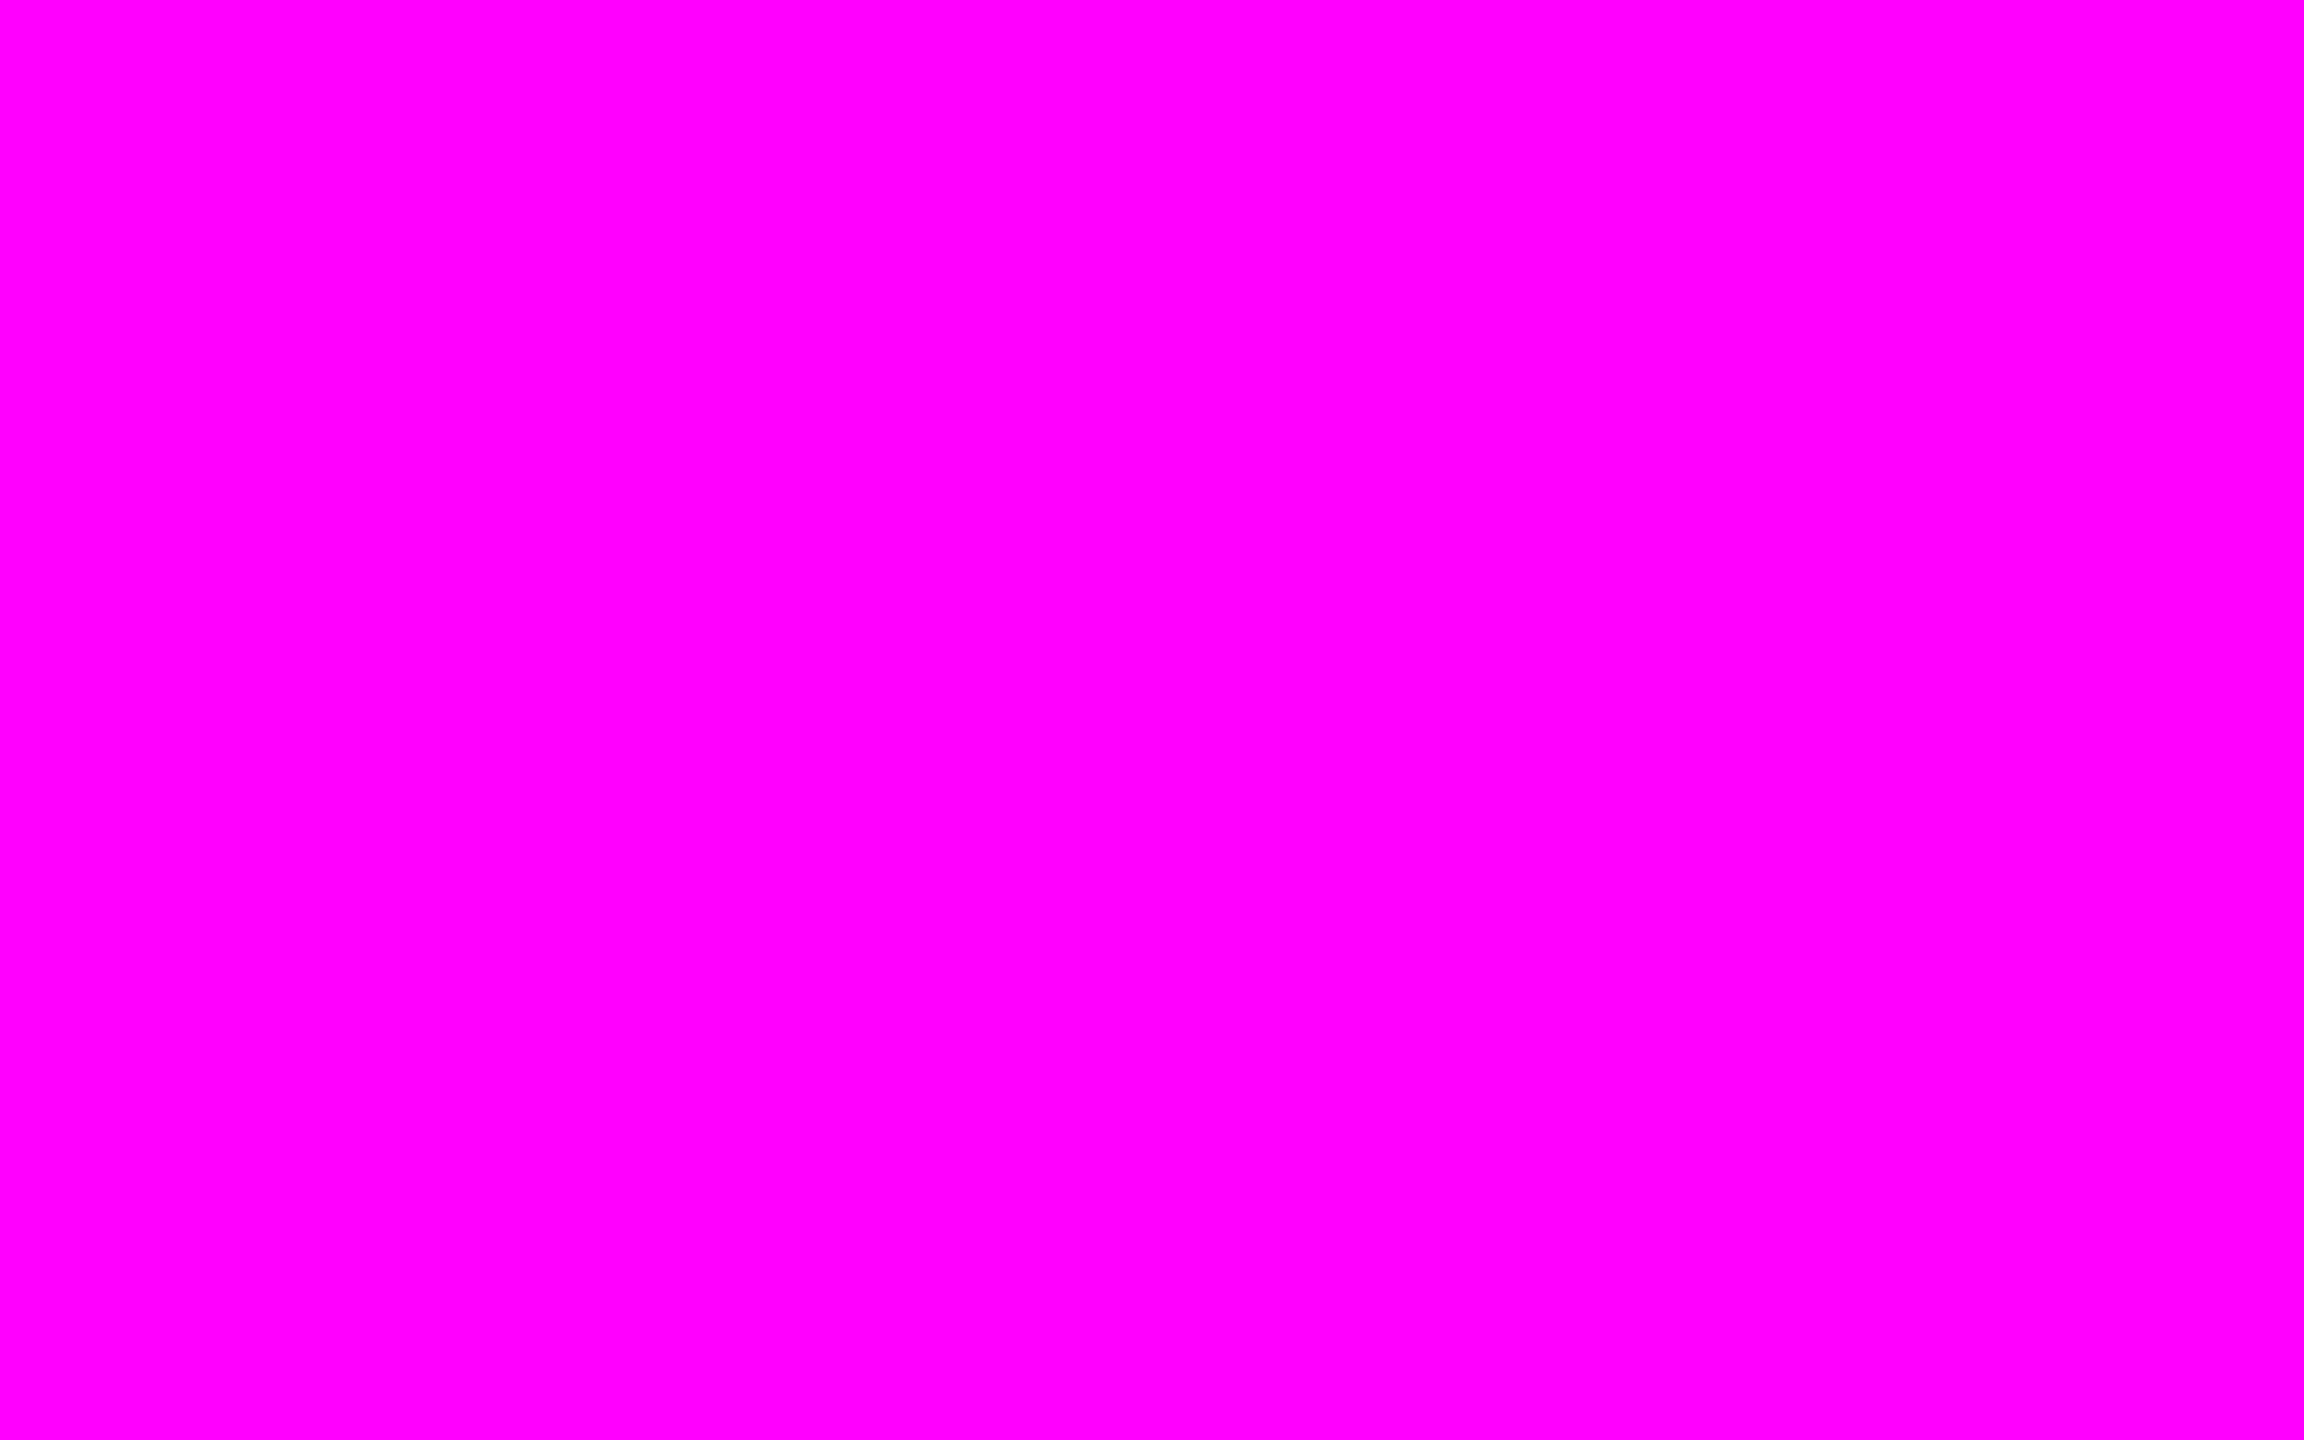 2304x1440 Magenta Solid Color Background